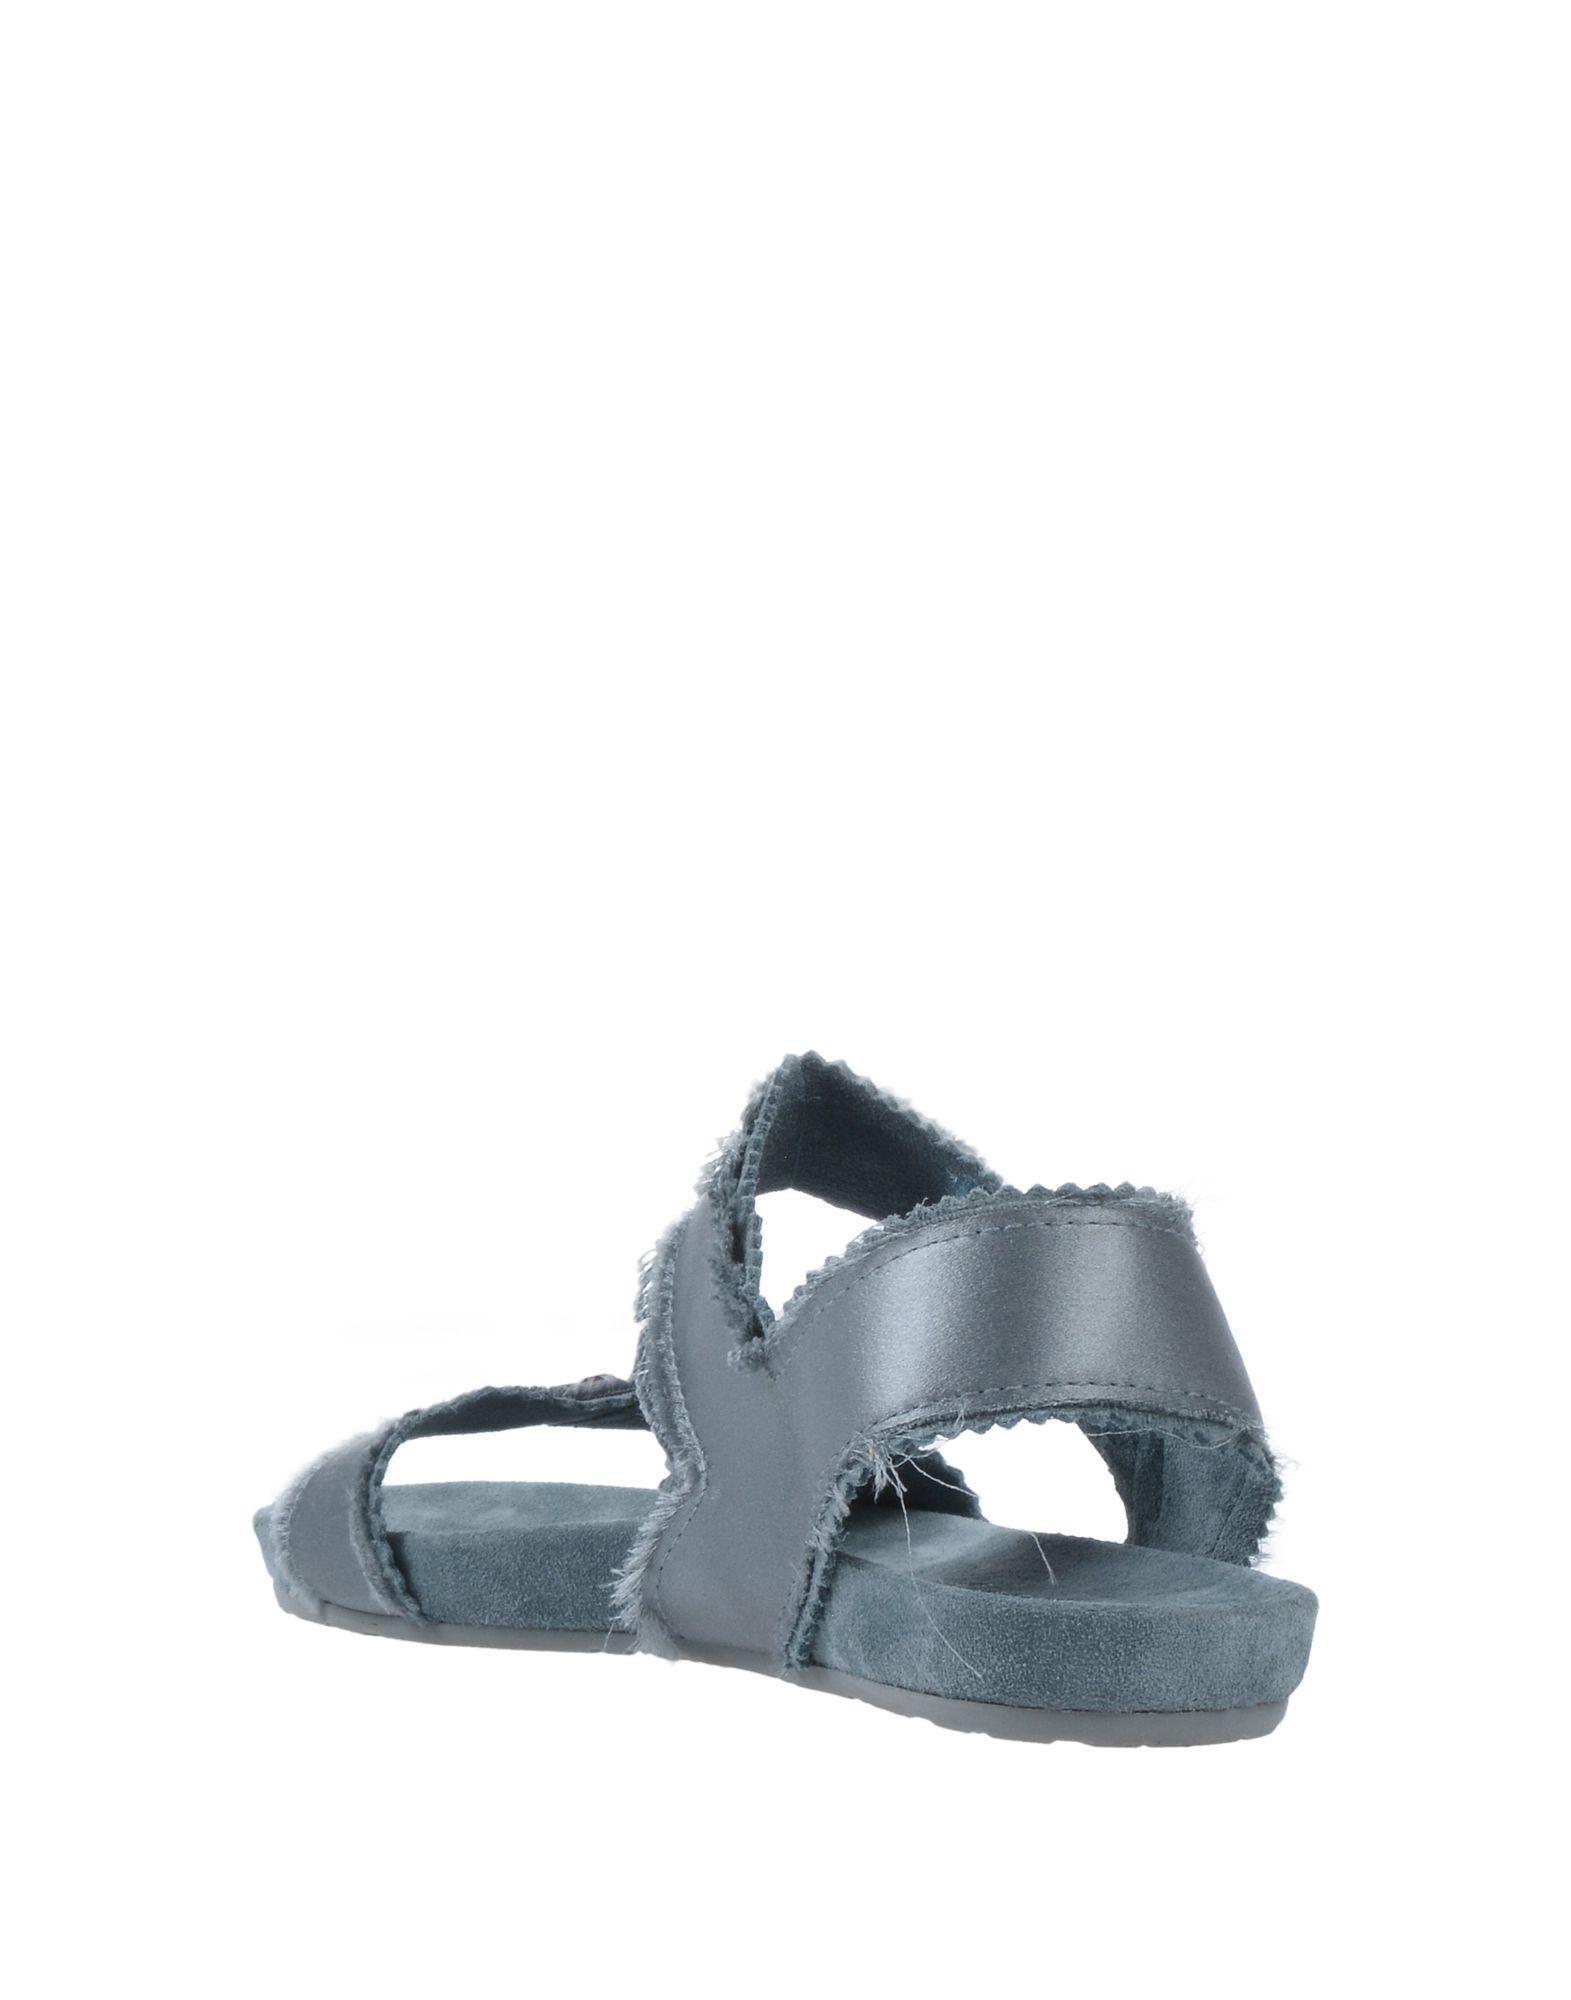 Pedro Garcia Blue Lyst In Sandals hxQrCstd